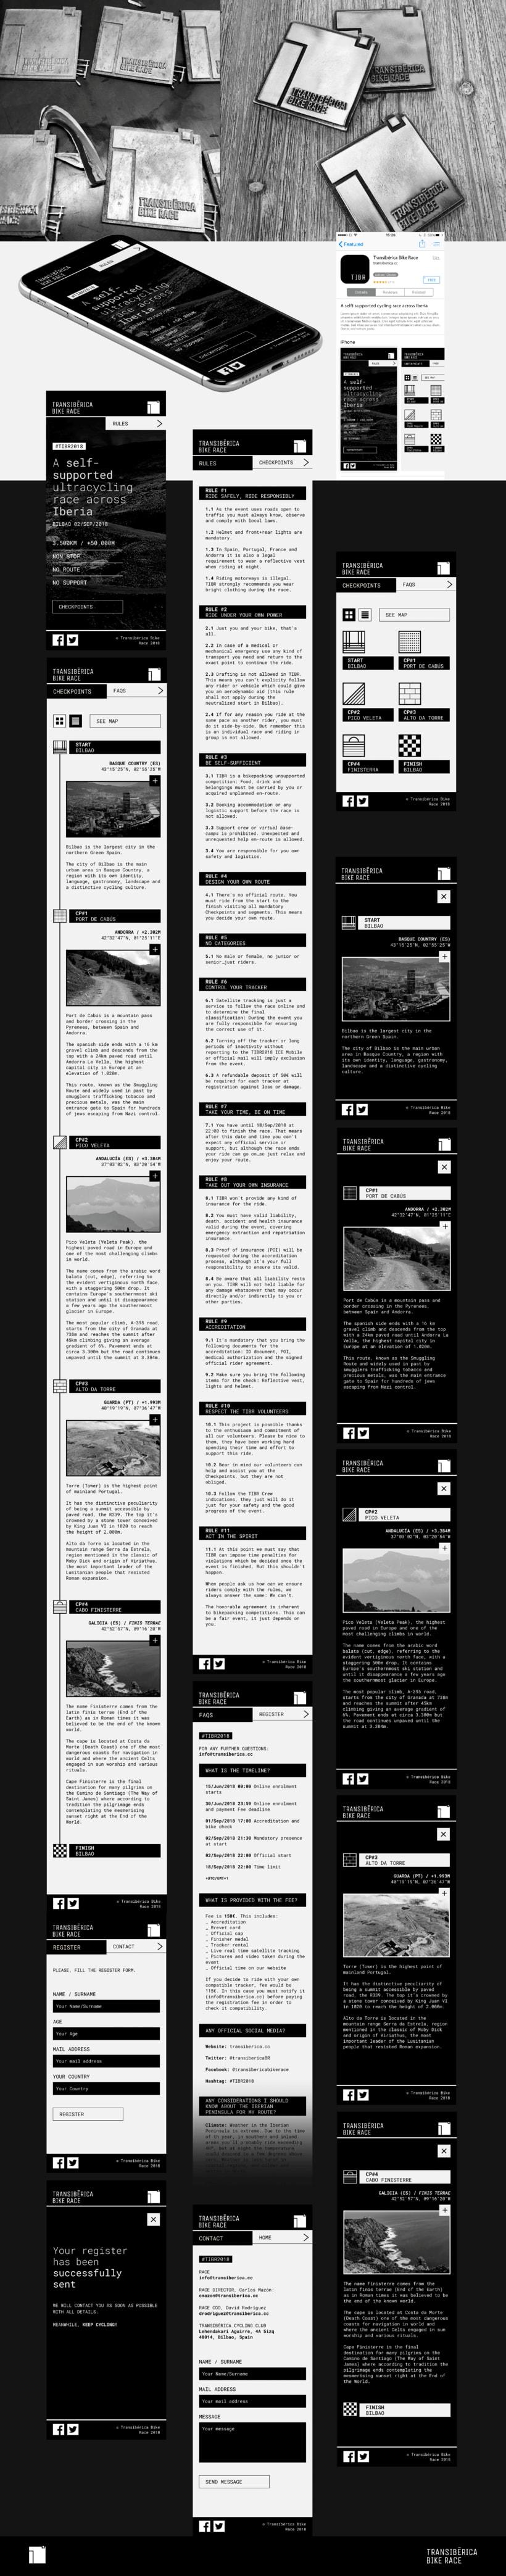 Transibérica Bike Race 4